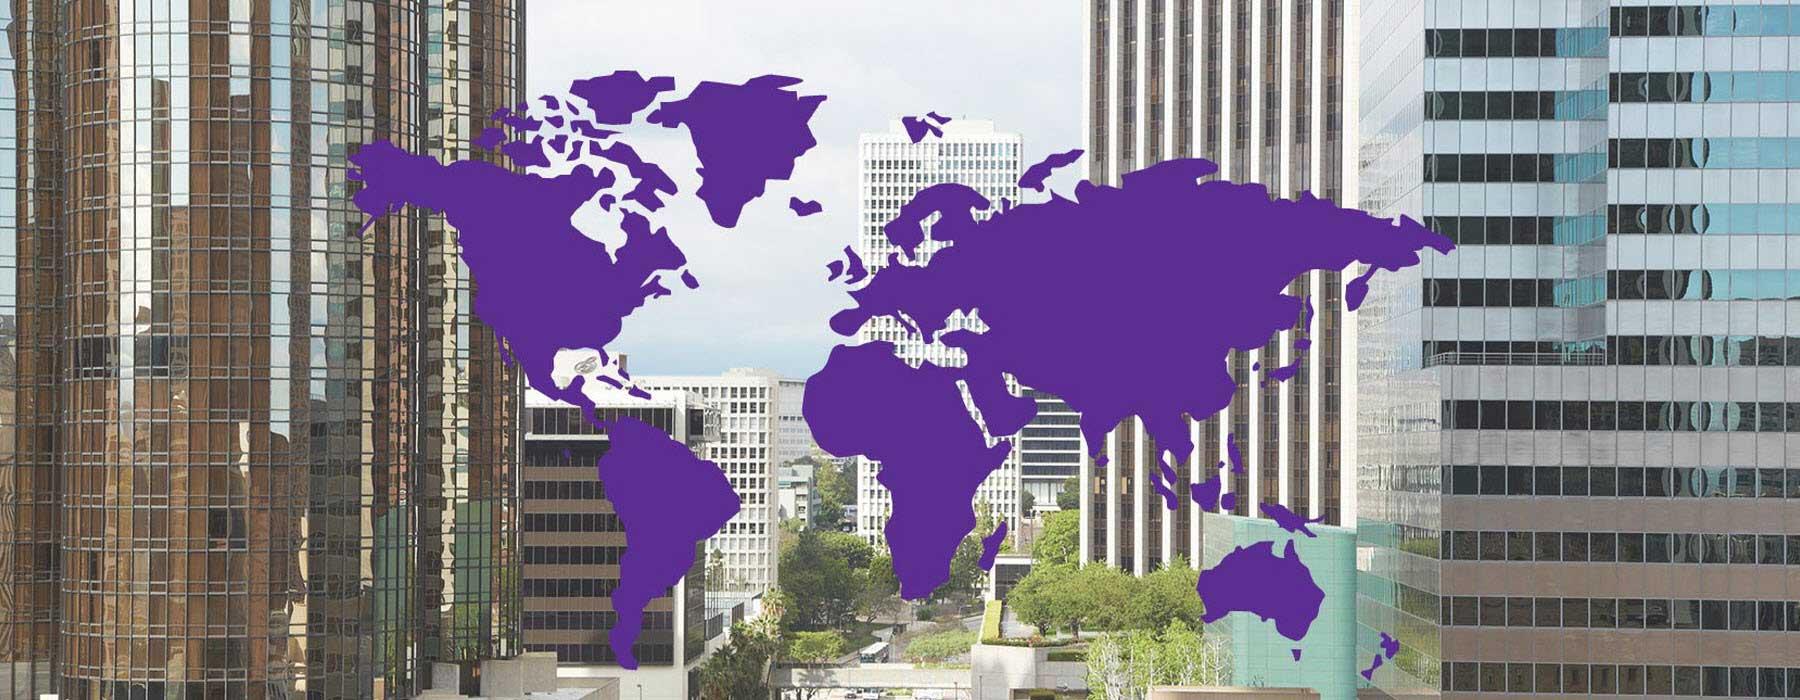 global availability global availability - Microsoft Visio Home Use Program